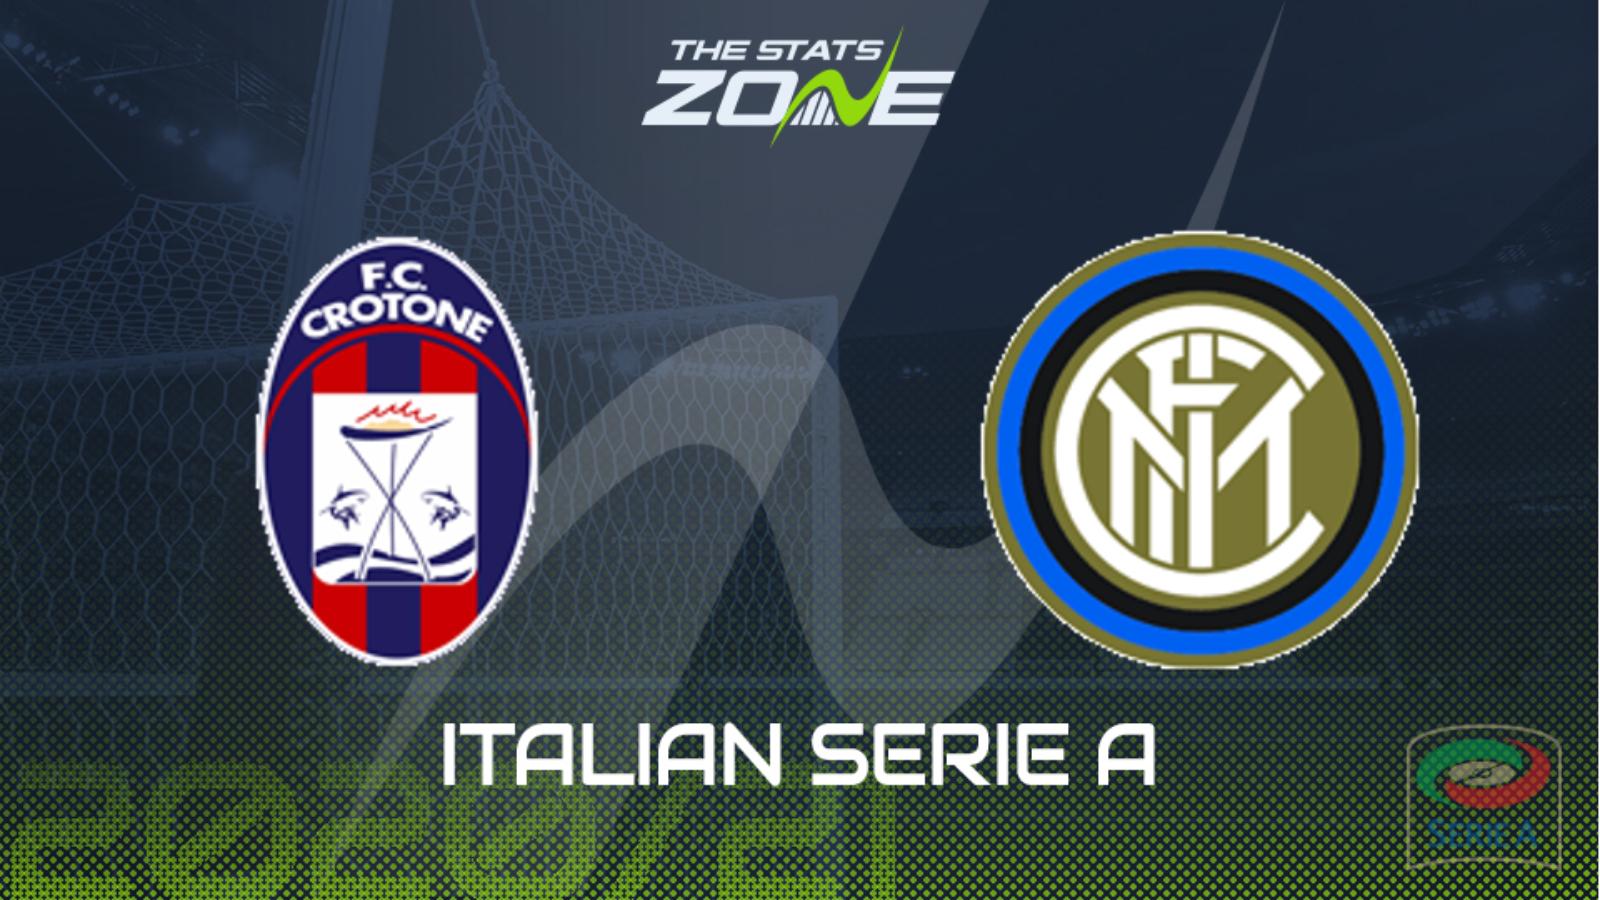 Crotone vs Inter Milan Full Match – Serie A 2020/21